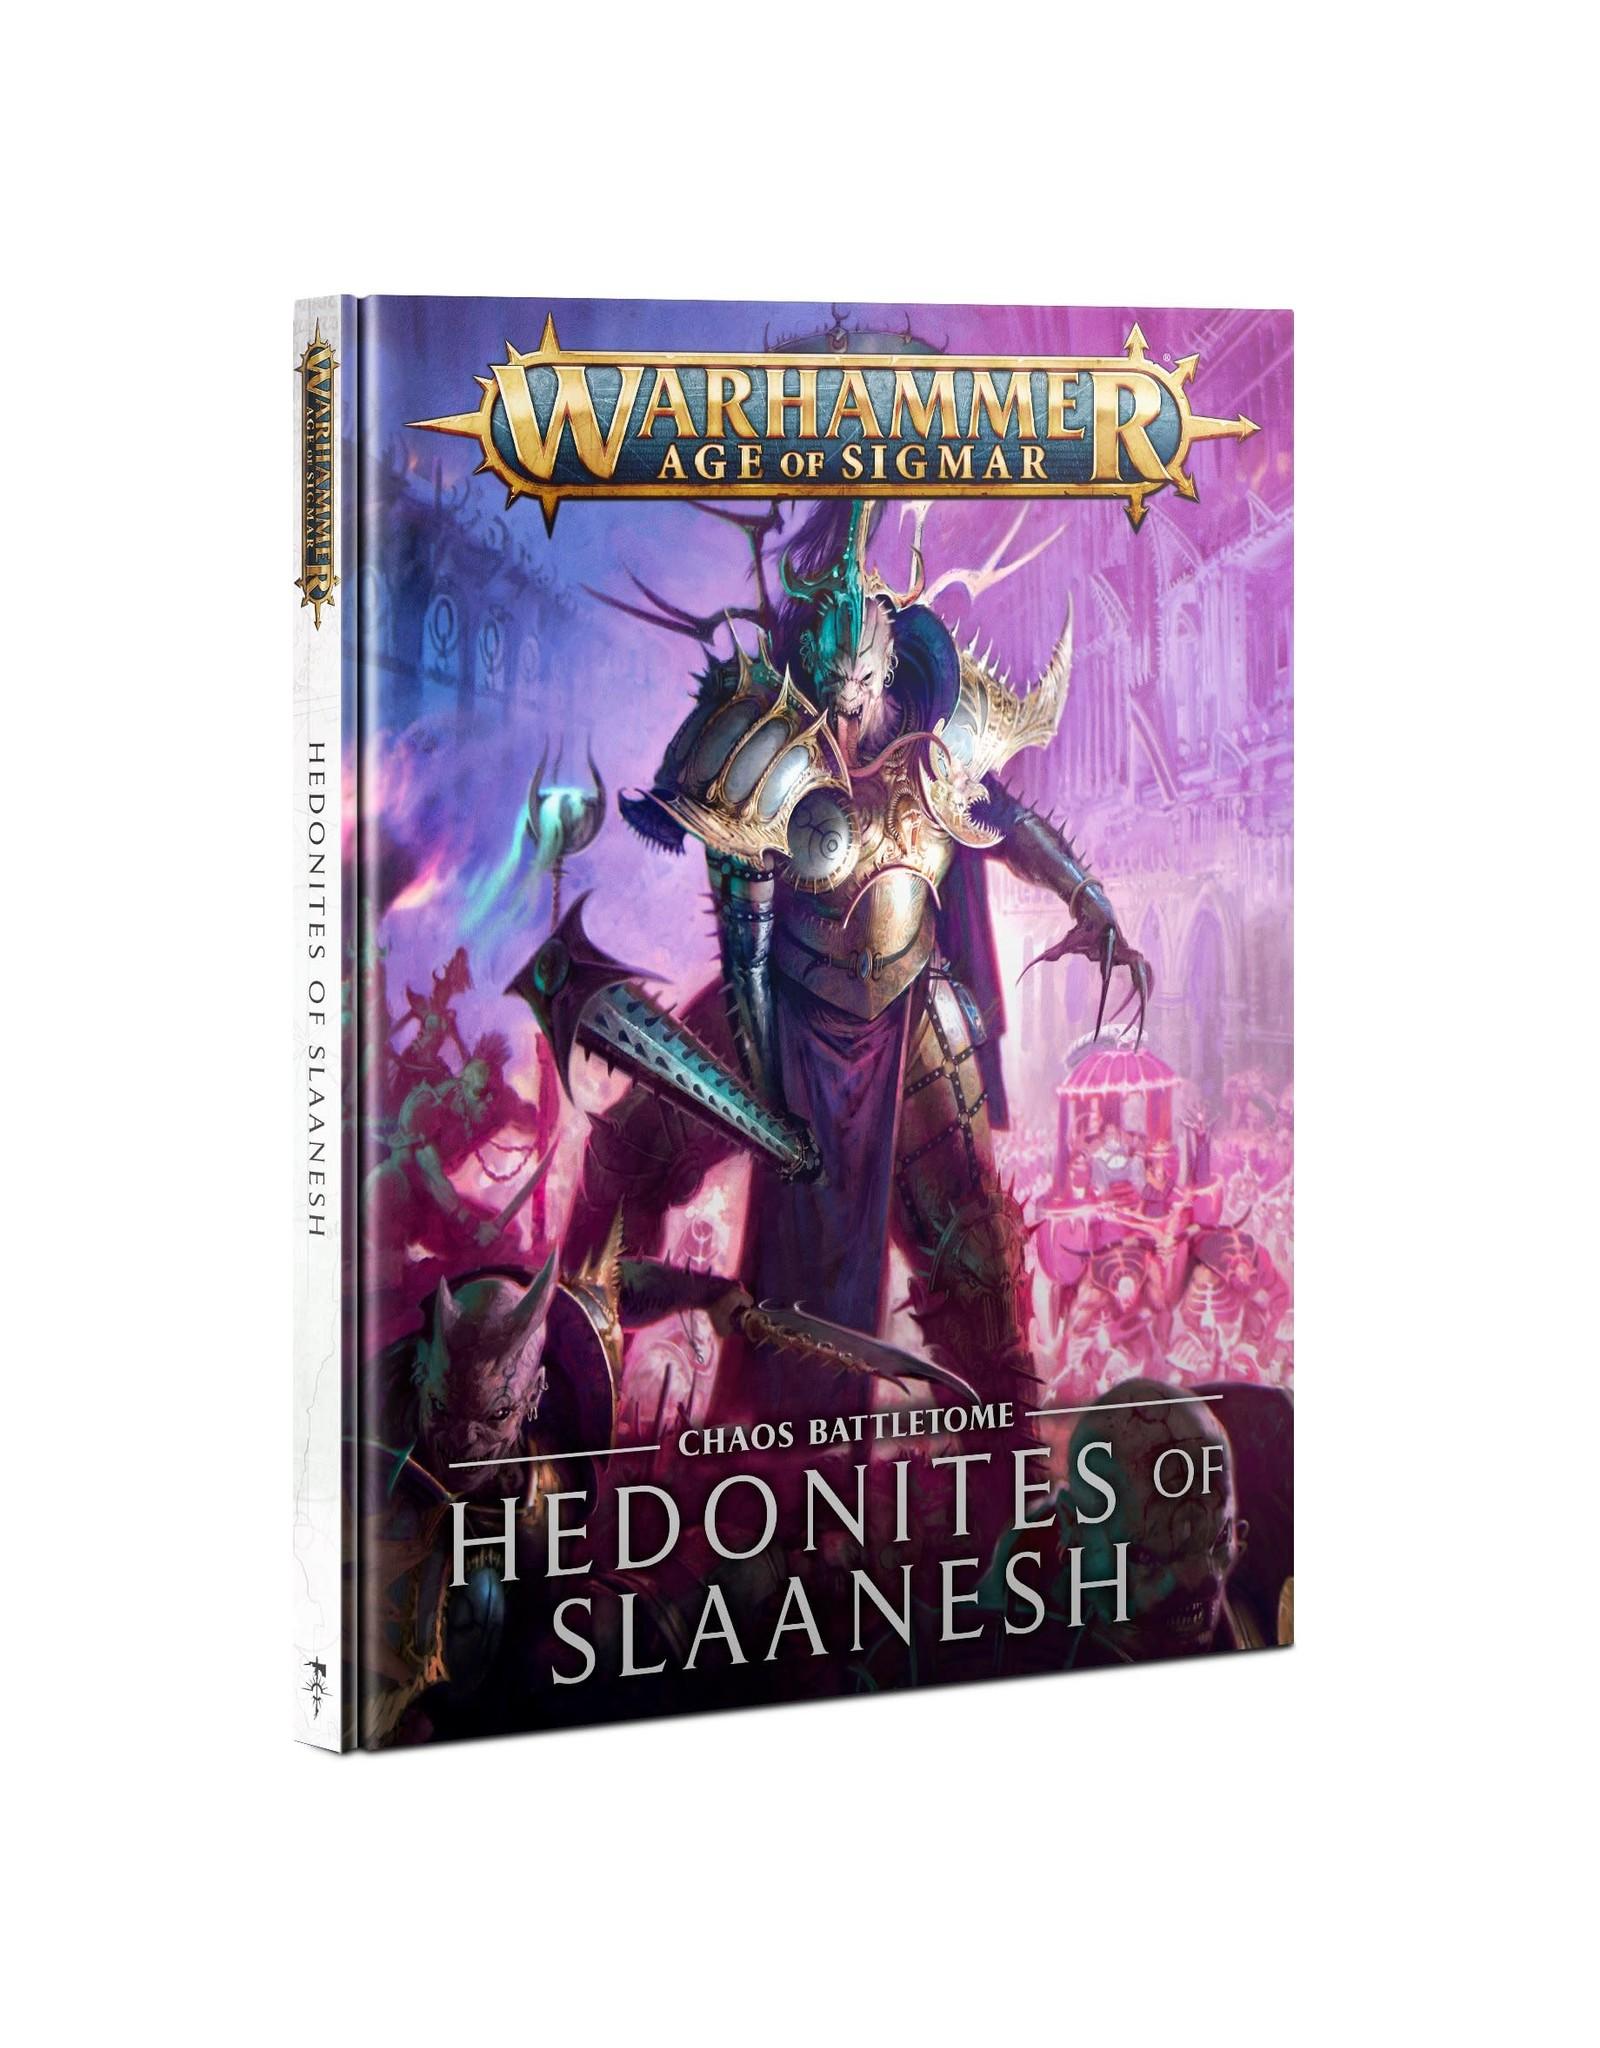 Warhammer AoS WHAoS Chaos Battletome - Hedonites of Slaanesh 2021